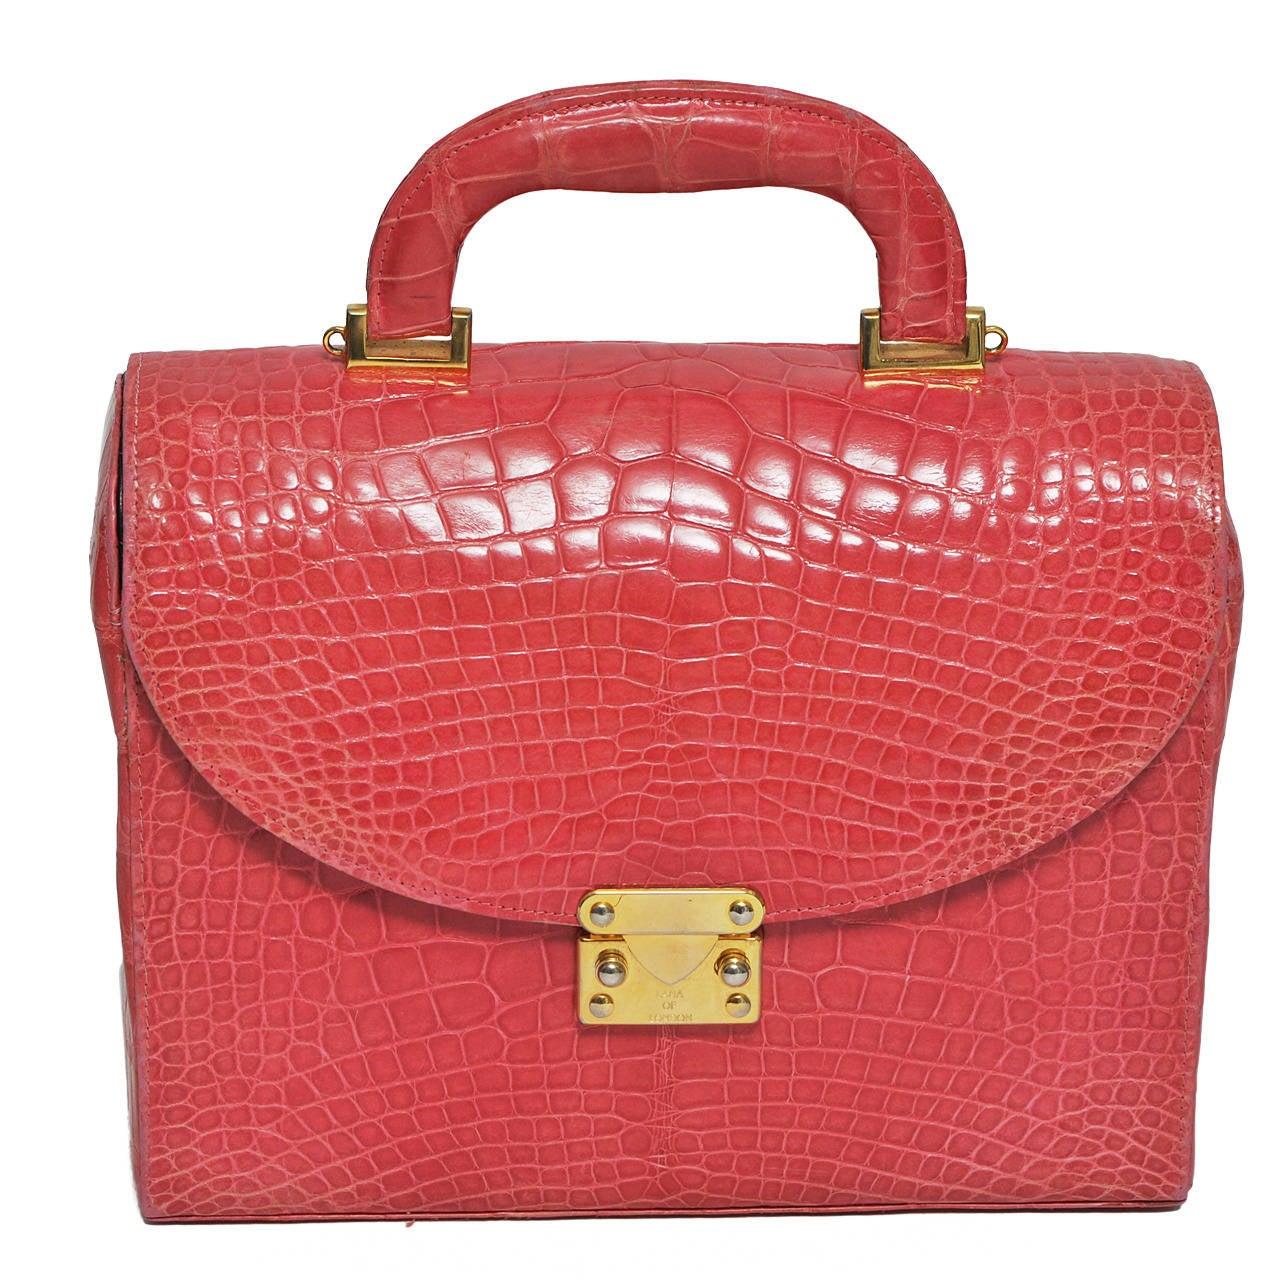 Lana of London Shrimp Alligator Handbag